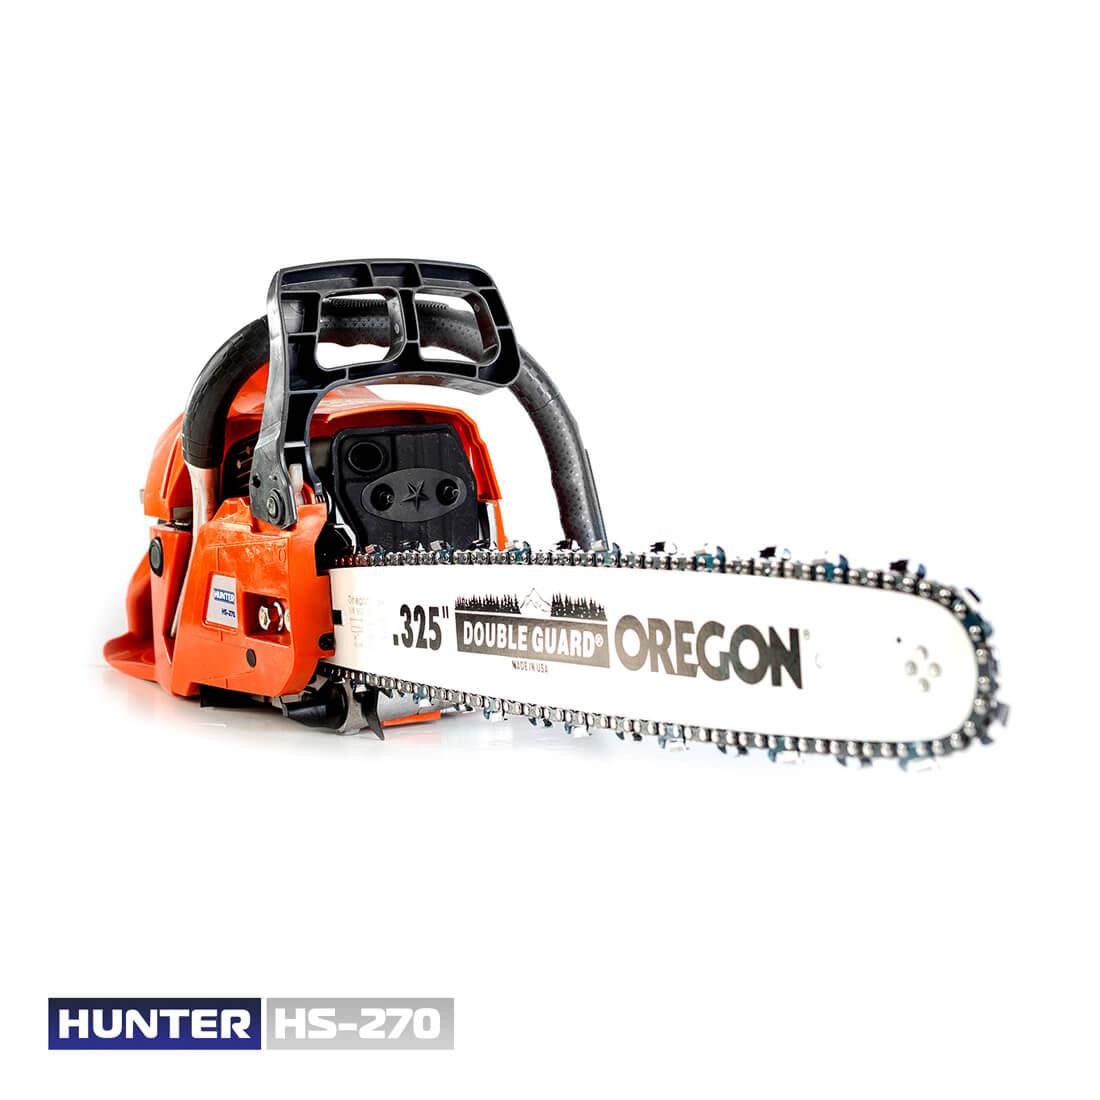 Фото Hunter HS-270 цена 2670грн №4 — Hunter